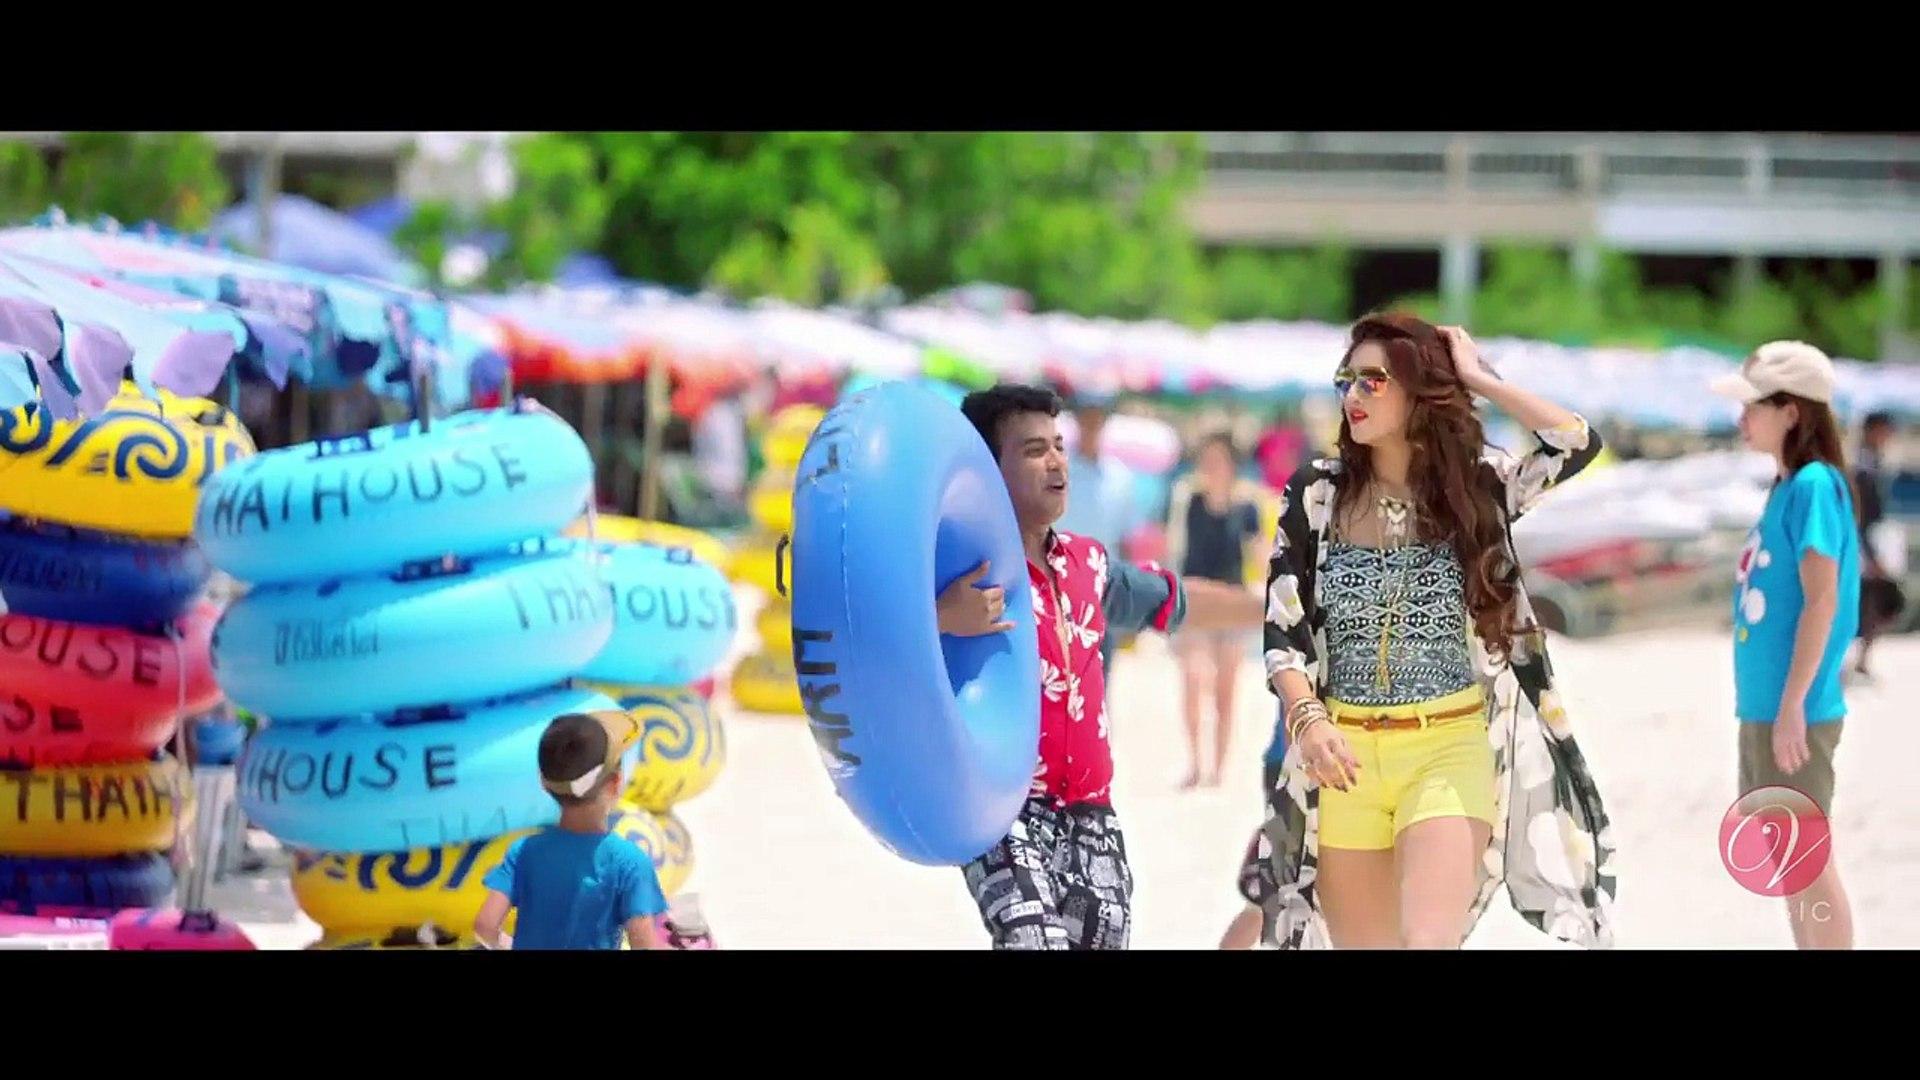 Darling Bengali Video Song Kelor Kirti 2016 Dev Jisshu Sengupta Ankush Mimi Nusrat Jahan Koushani Mukherjee Raja Chanda Dev Sen Vicky A Khan Madhuraa Bhattacharya Prasenjit Mallick